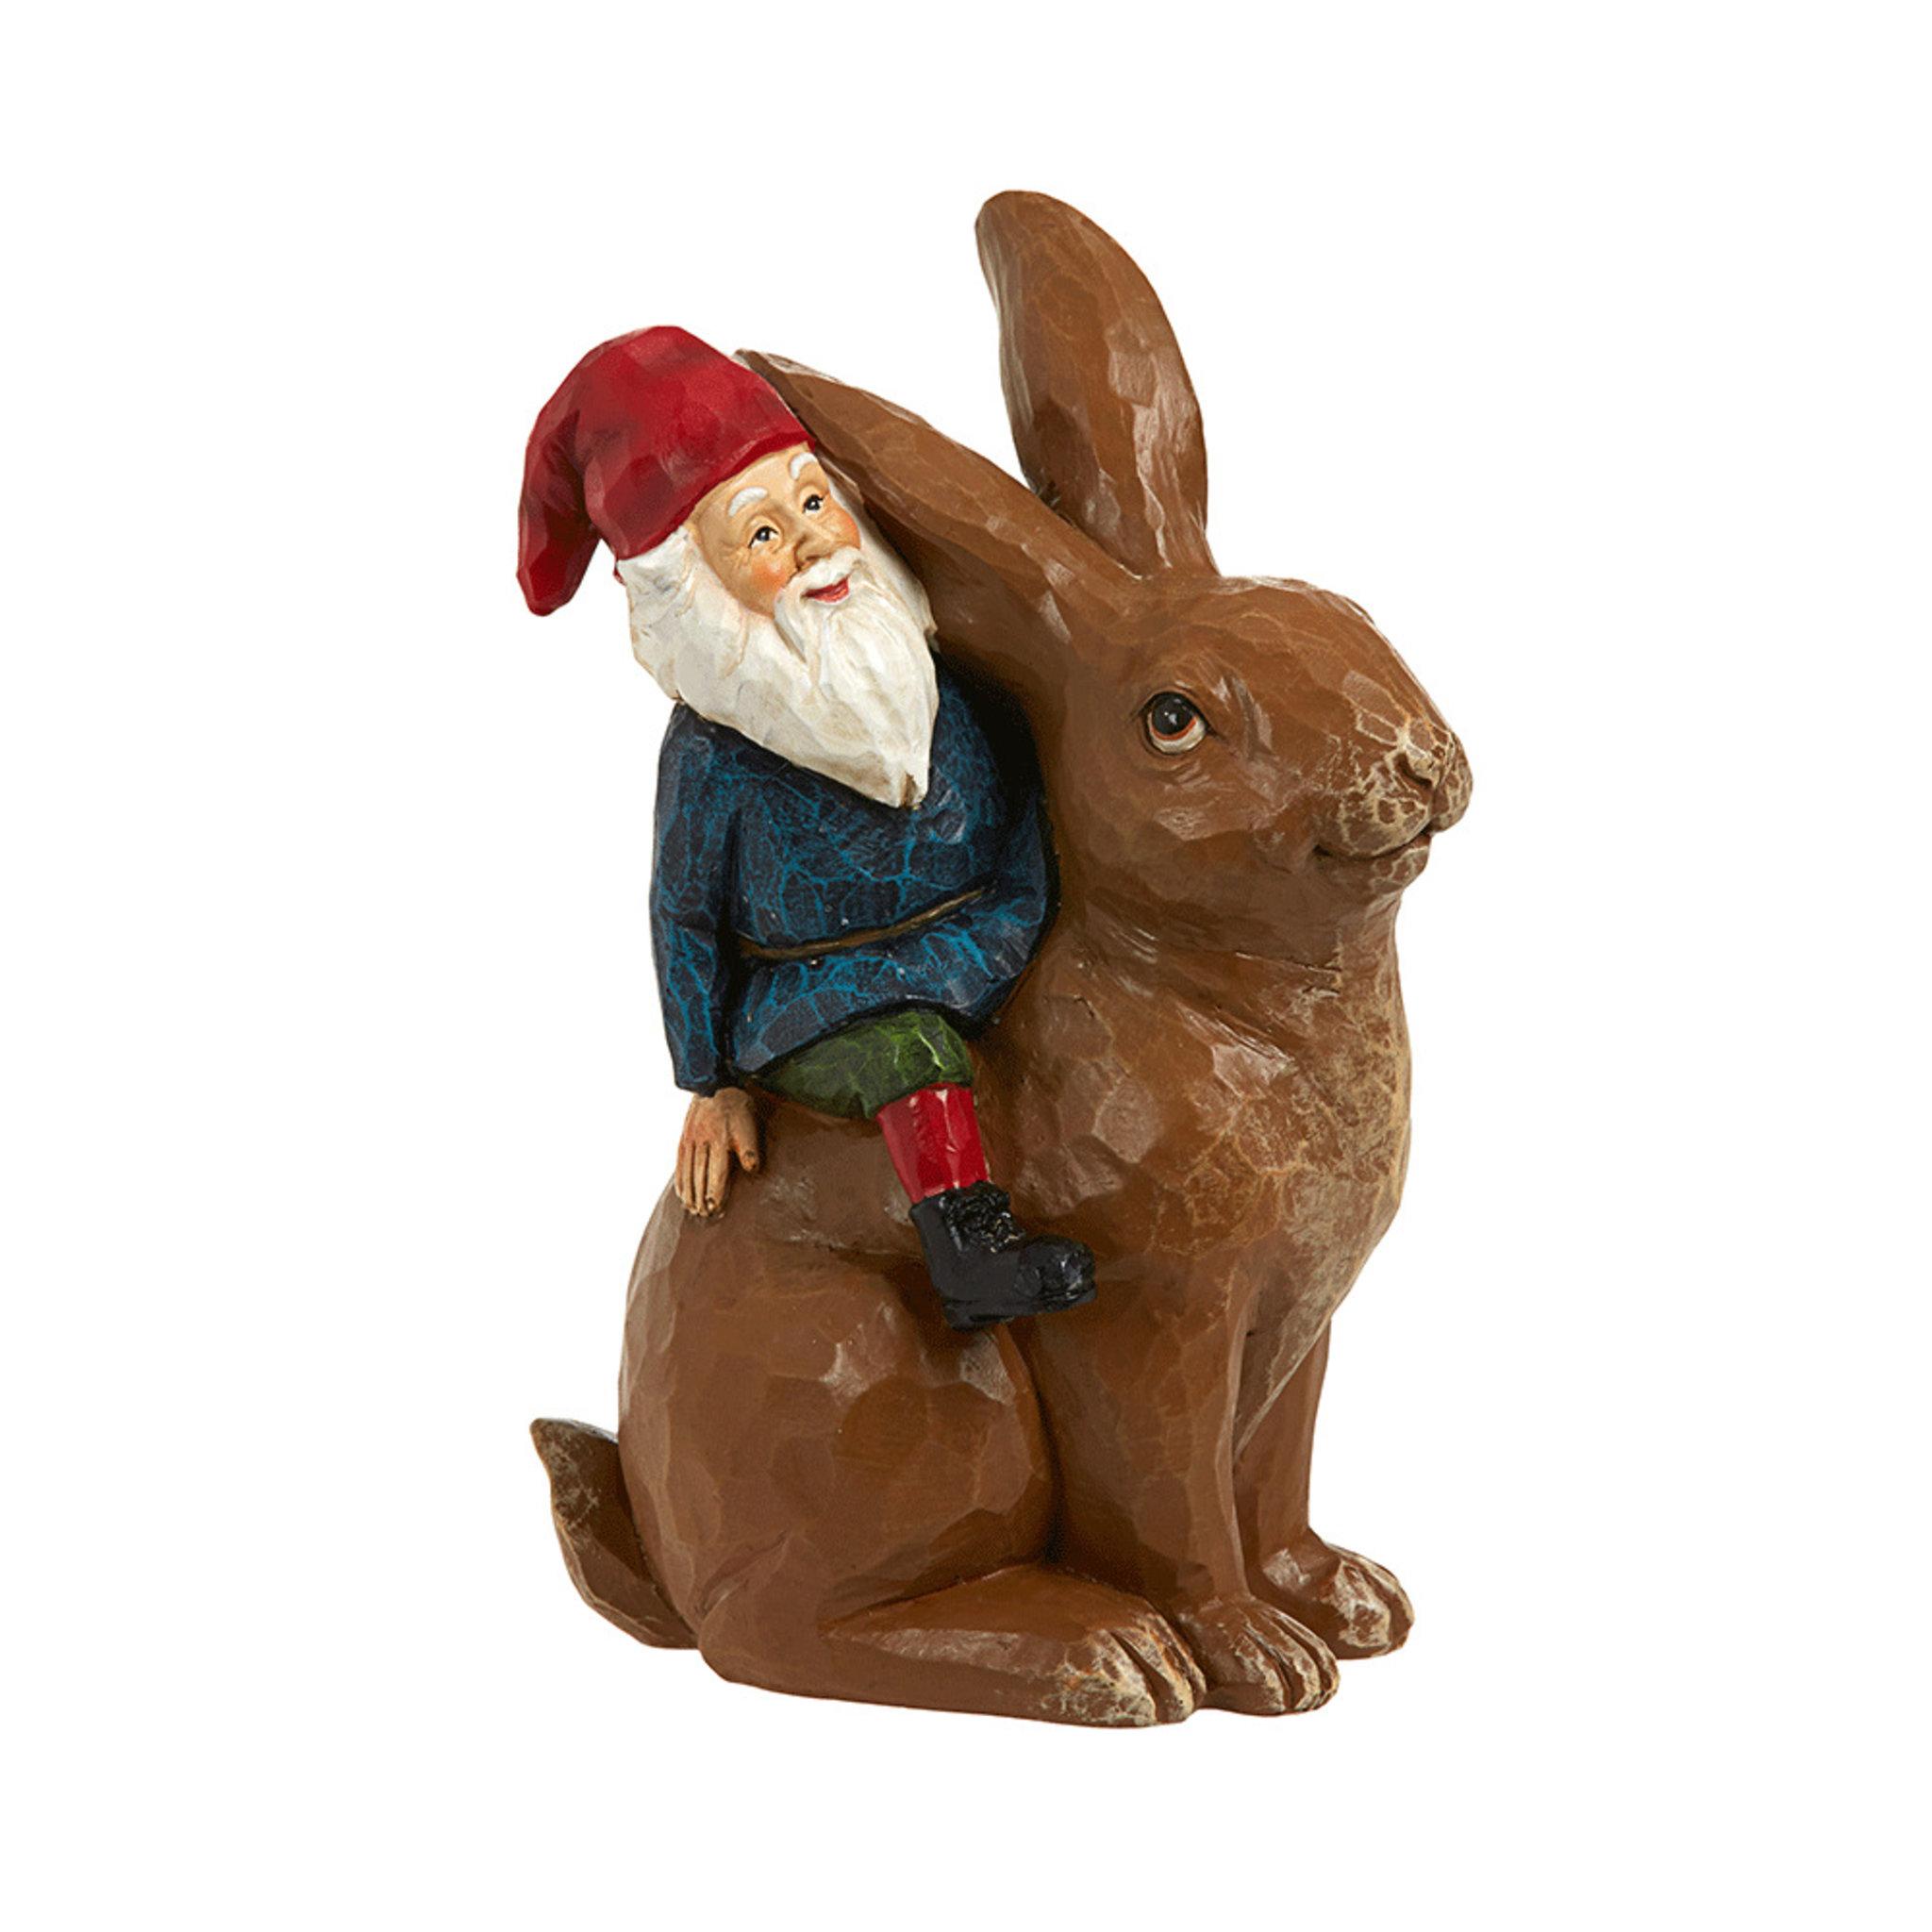 Juldekoration tomte & kanin, 16 cm